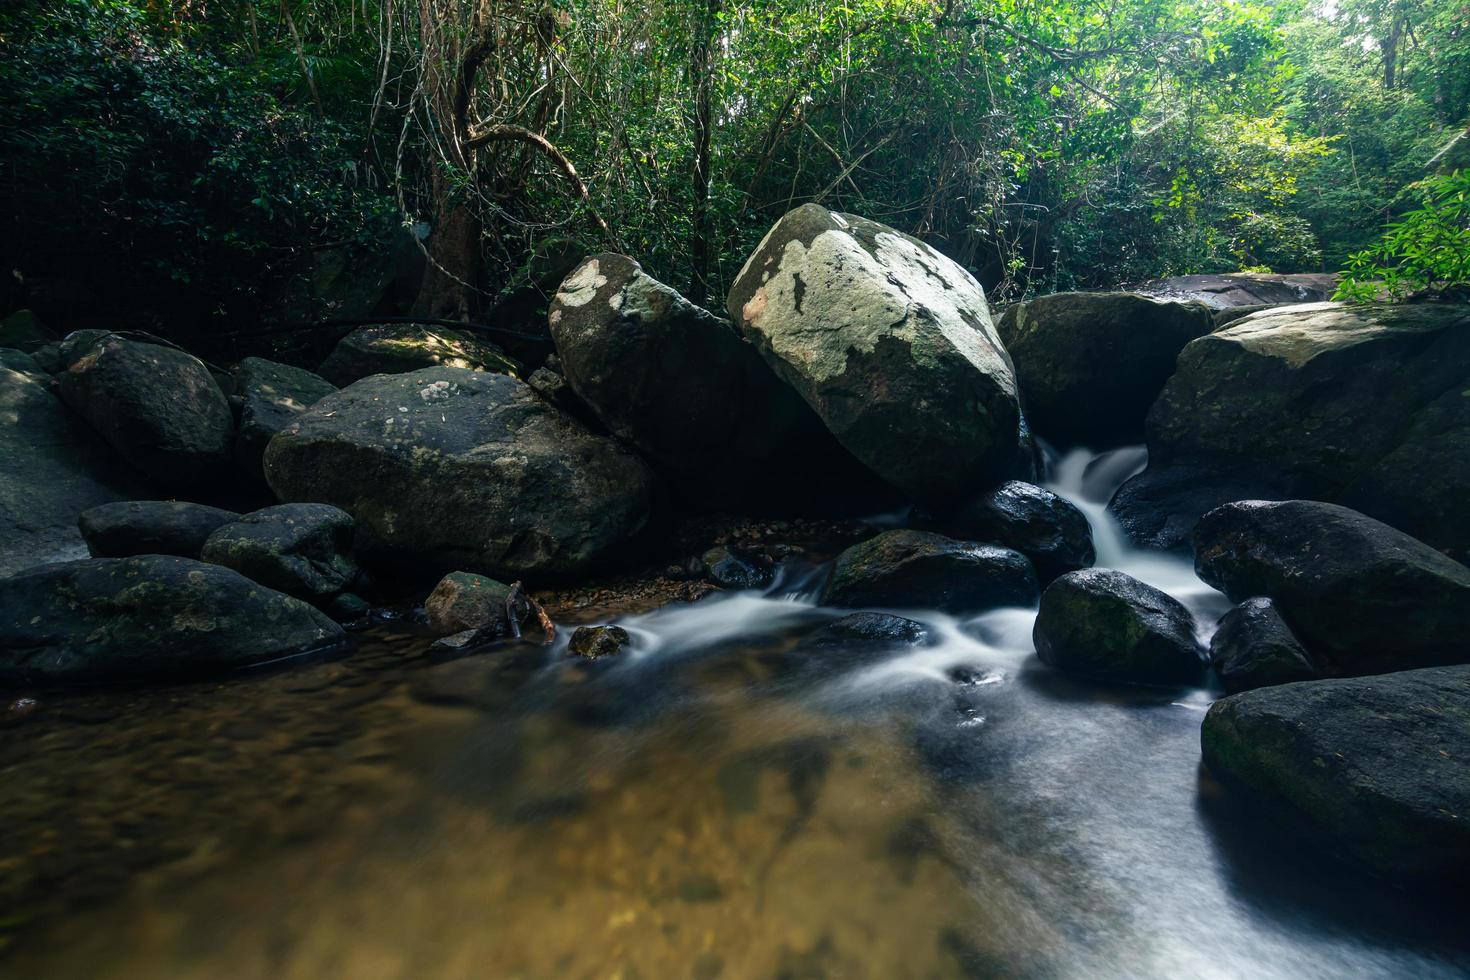 paisaje natural en las cascadas khlong pla kang foto